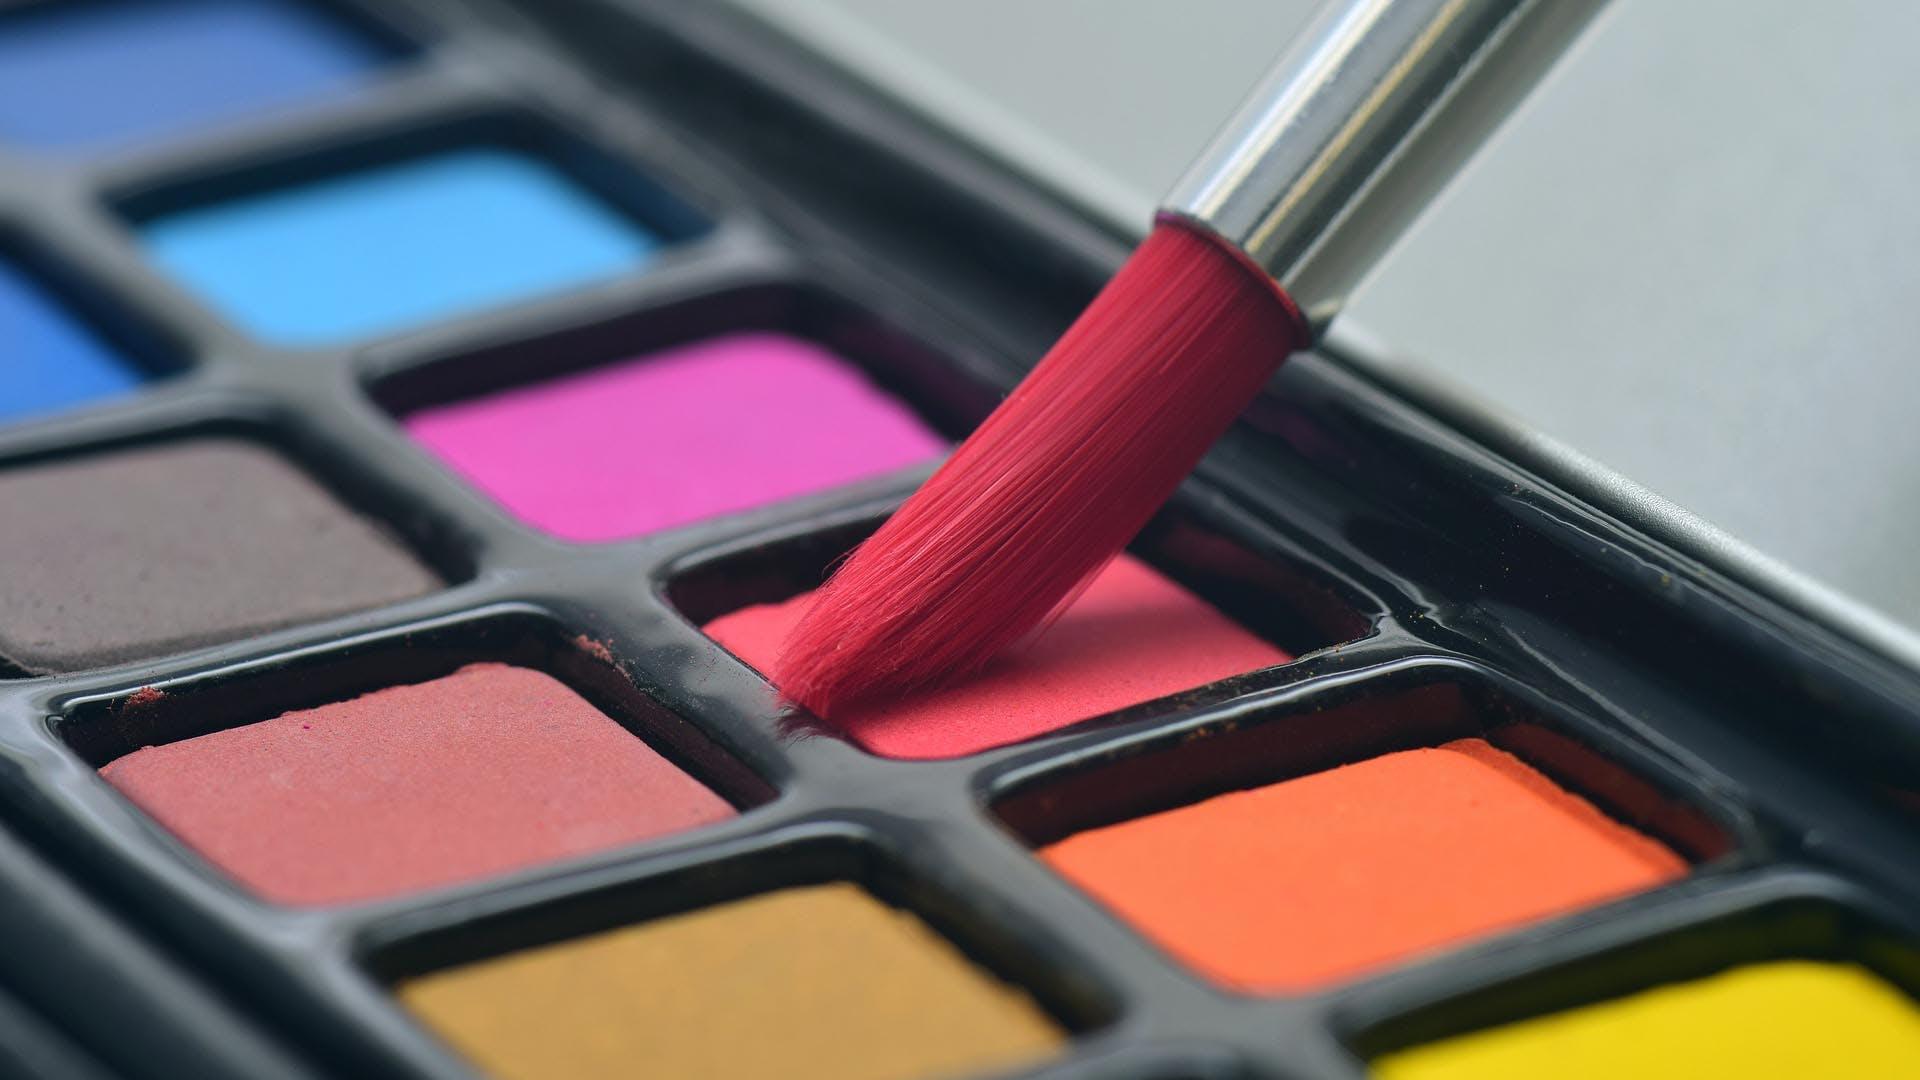 Eye shadow,Pink,Orange,Cosmetics,Red,Eye,Product,Beauty,Violet,Organ